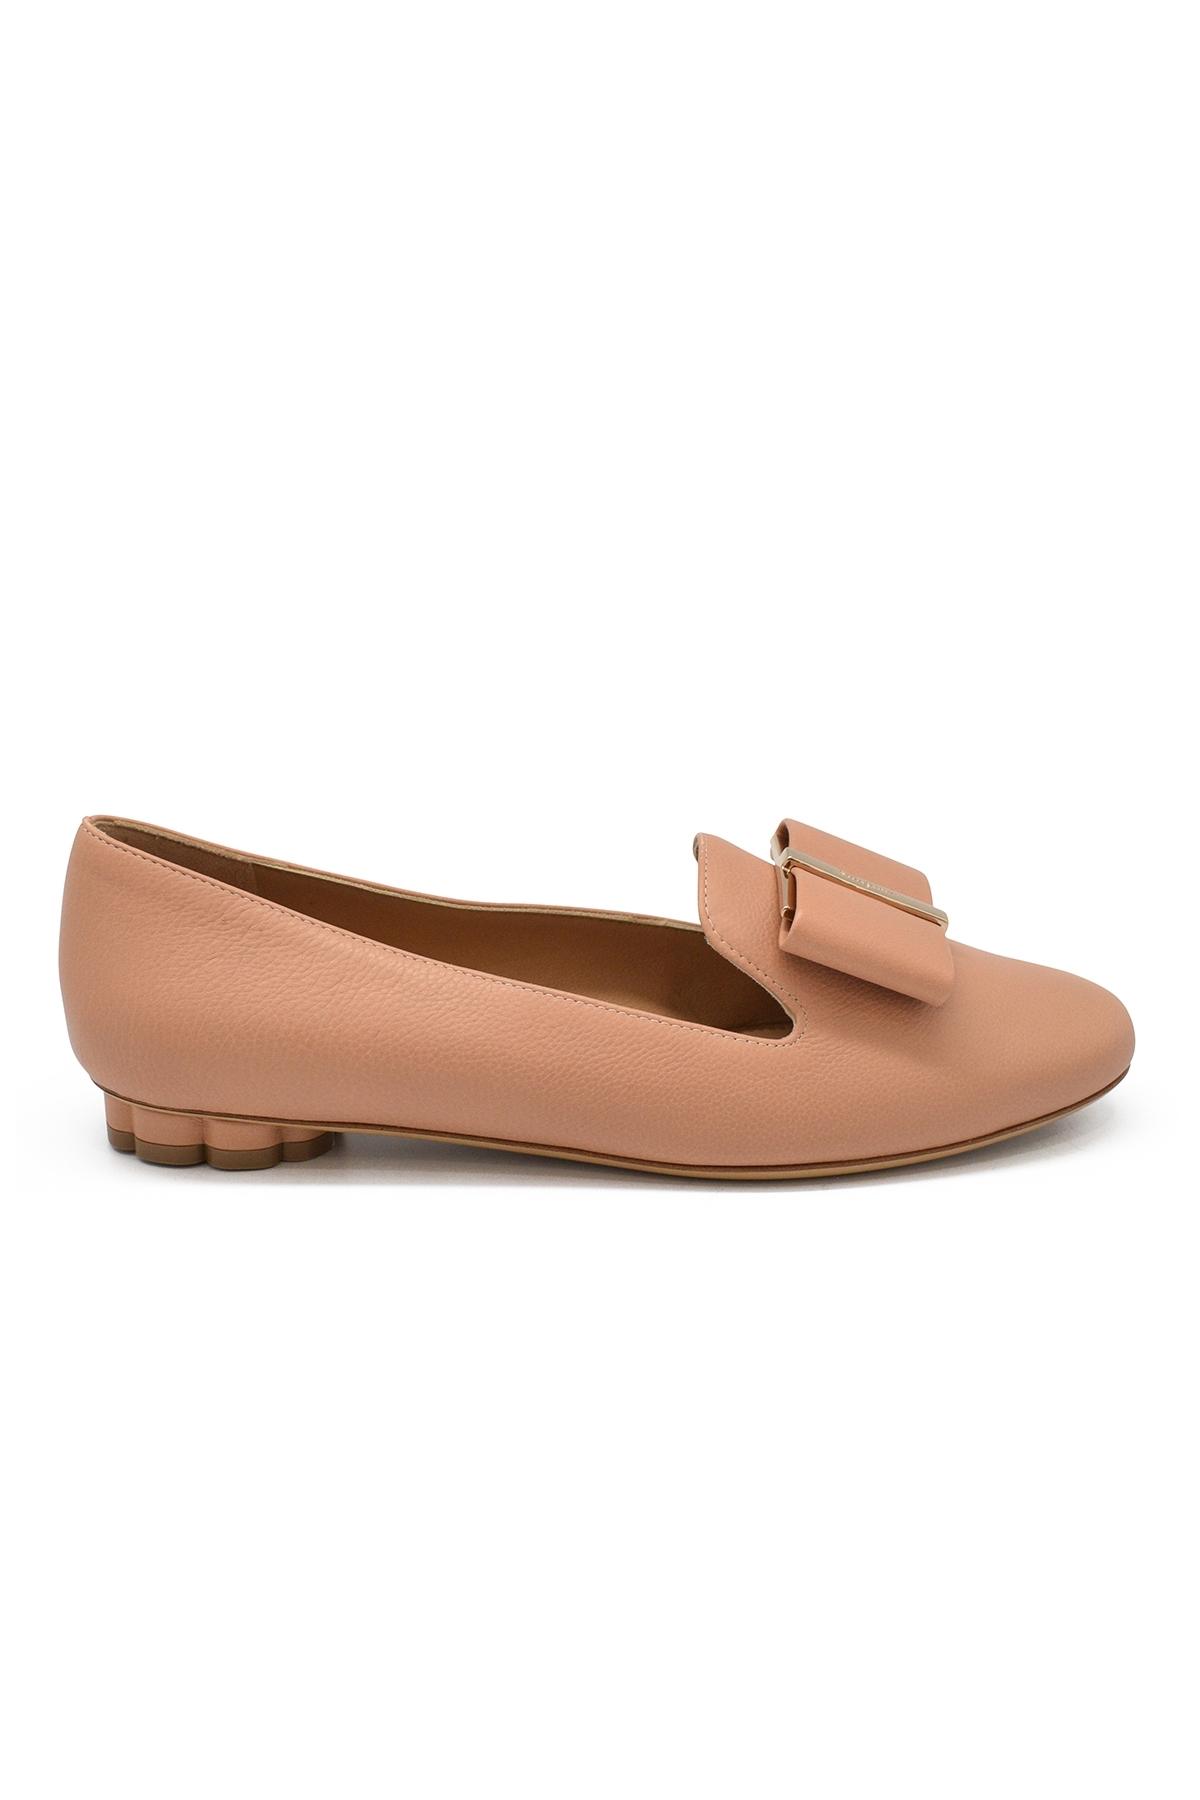 Sarno slippers